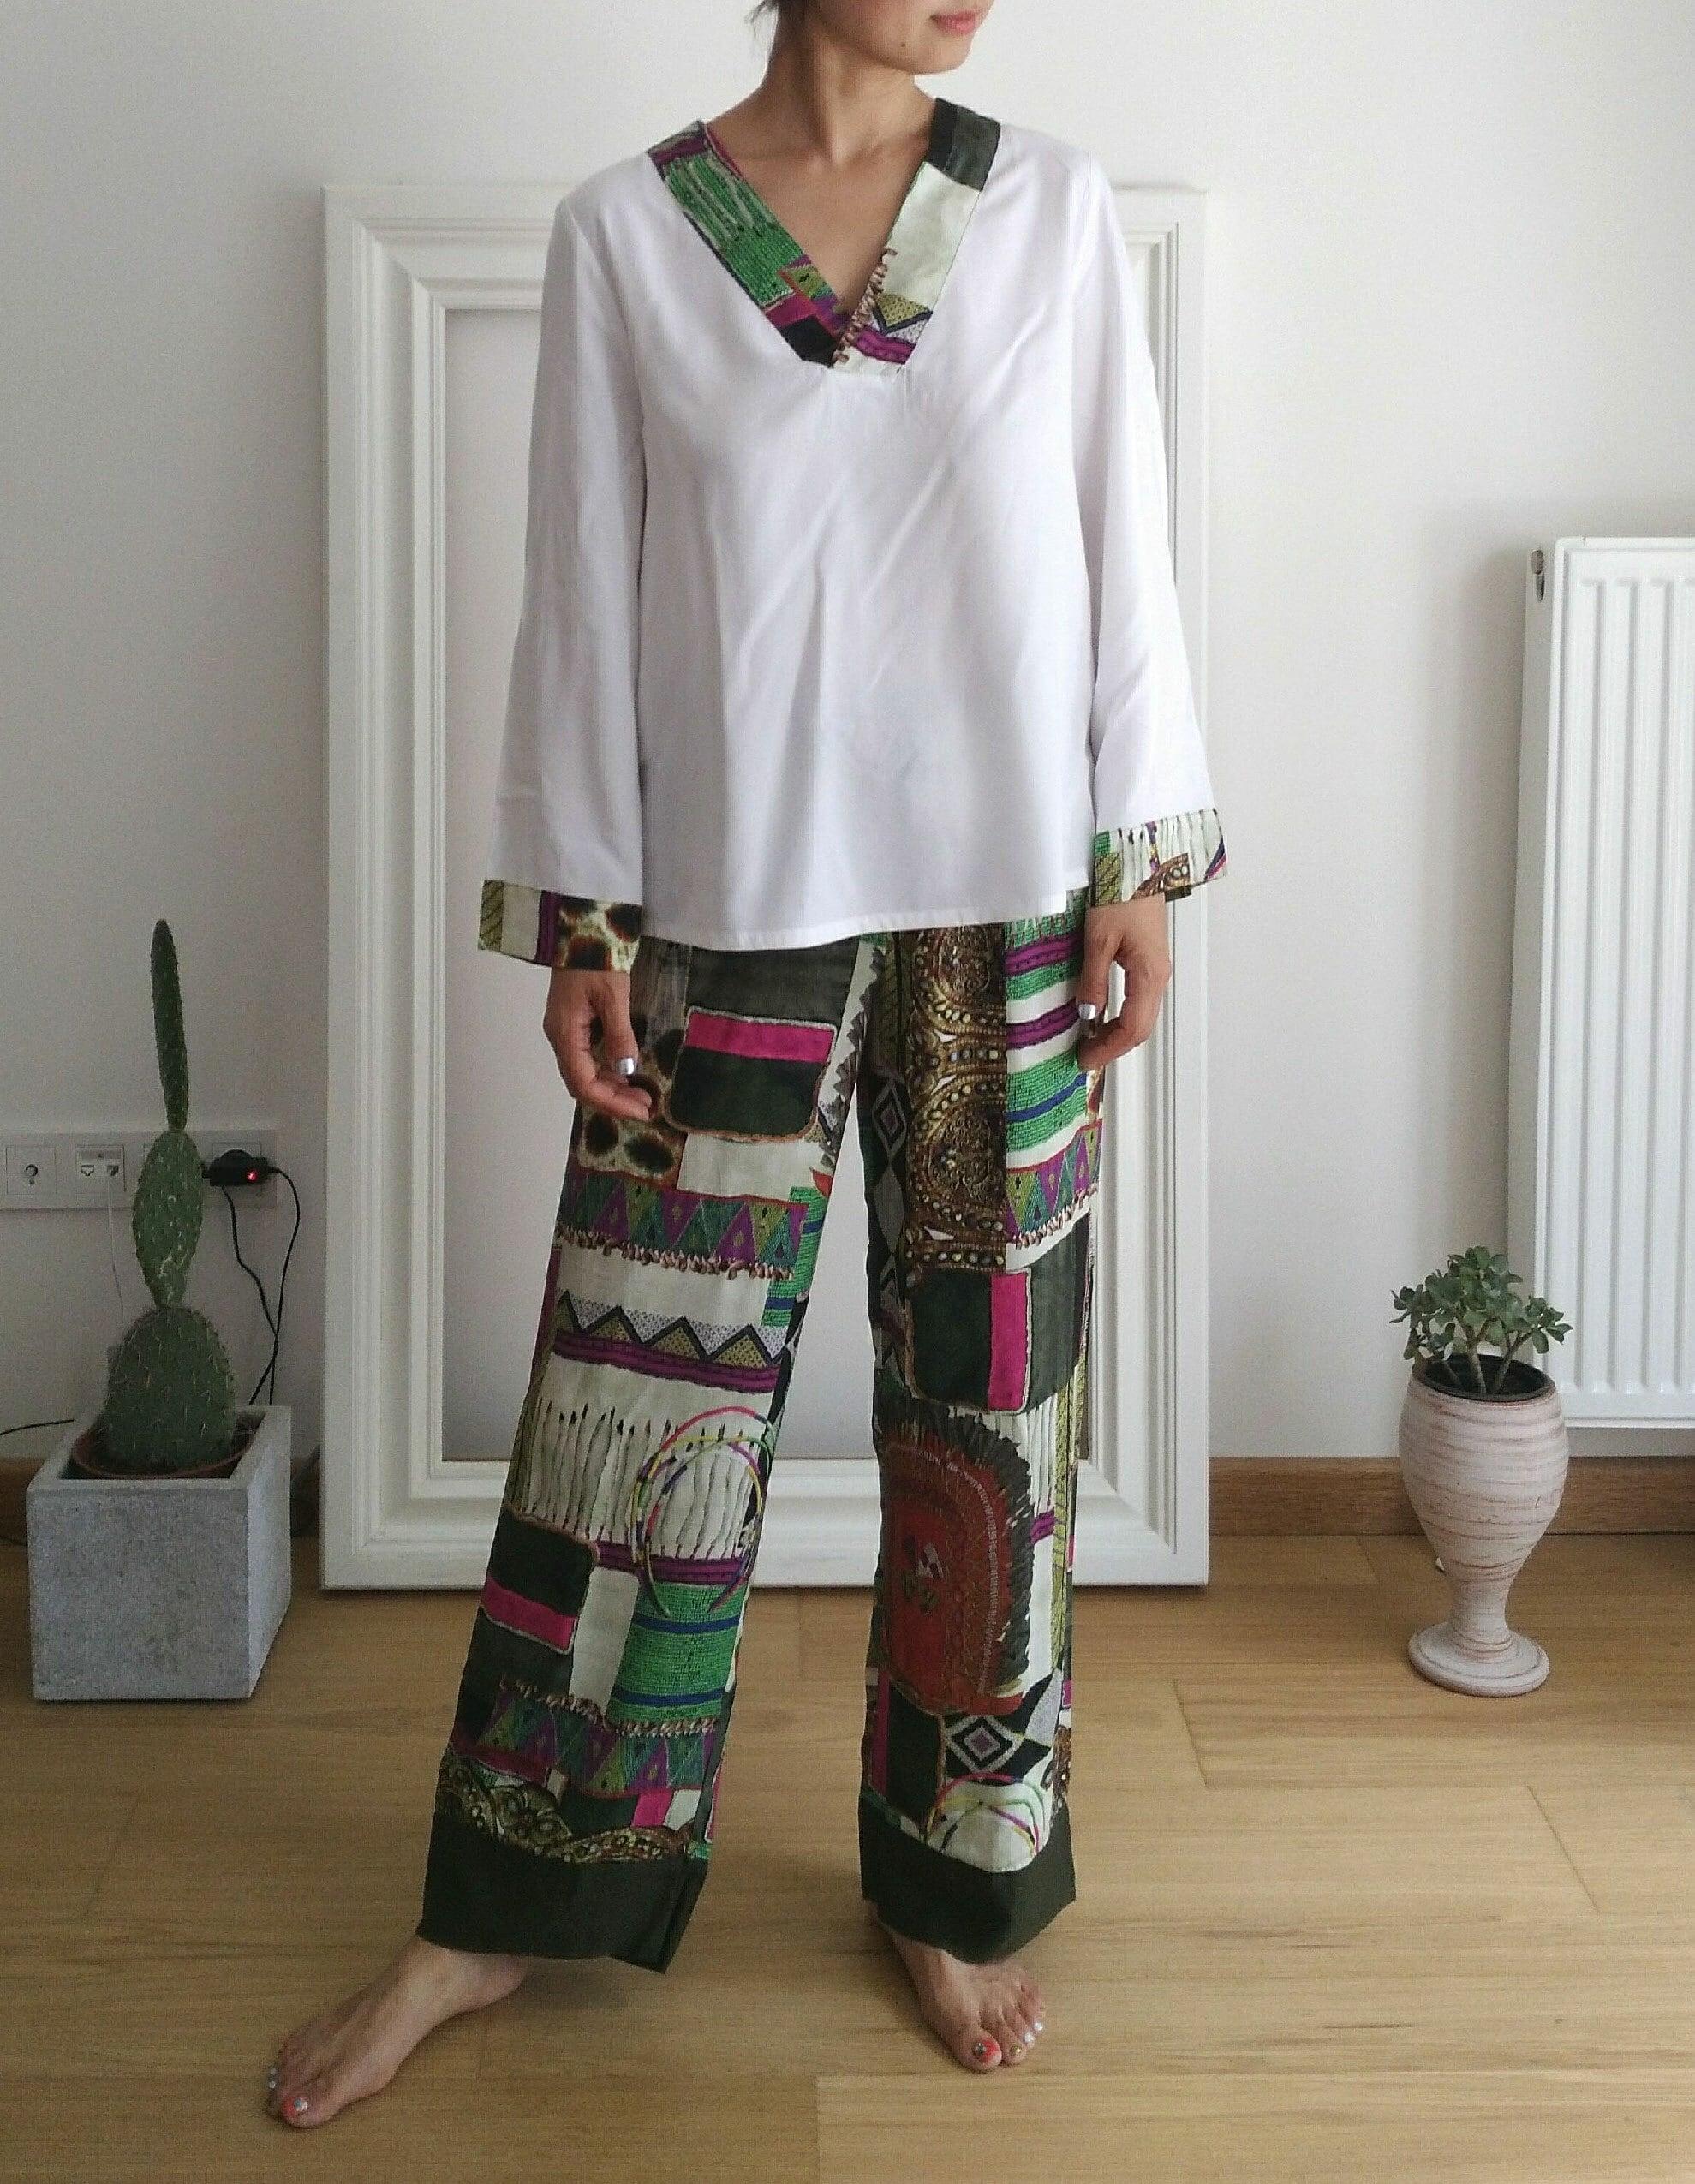 Pajama set up Africa Africa パジャマセットアップ アフリカアフリカ